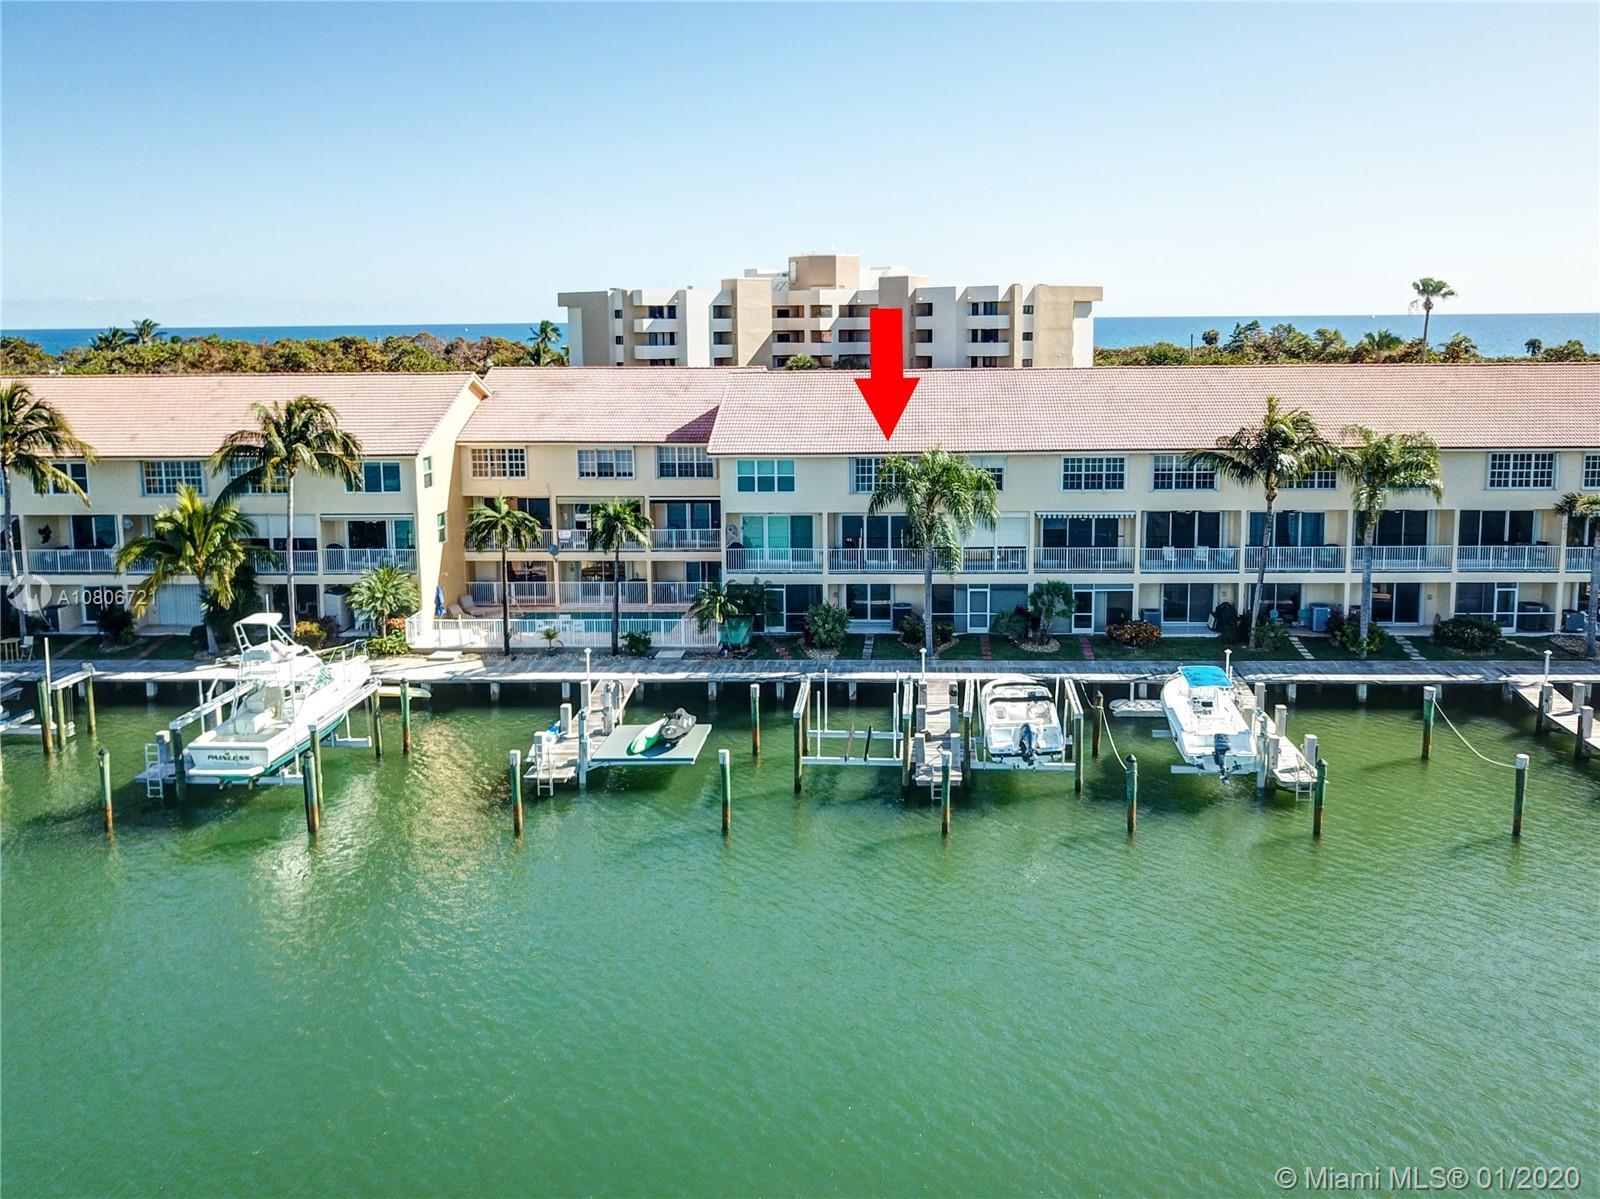 4226 N Ocean Dr, 4226 - Hollywood, Florida